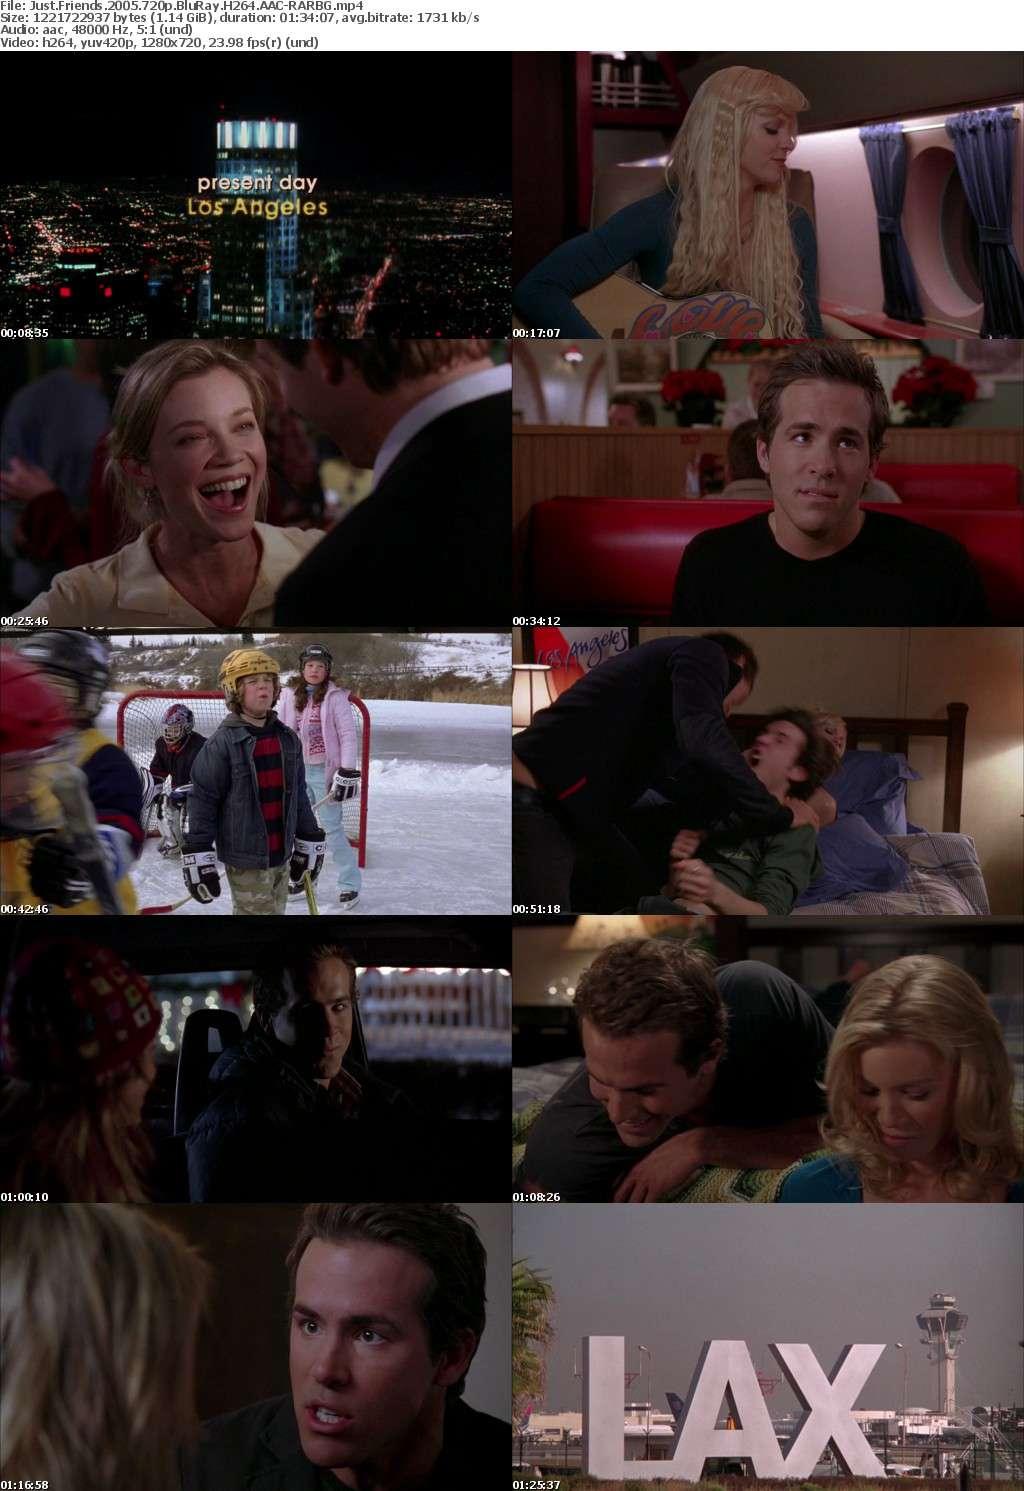 Just Friends 2005 720p BluRay H264 AAC-RARBG